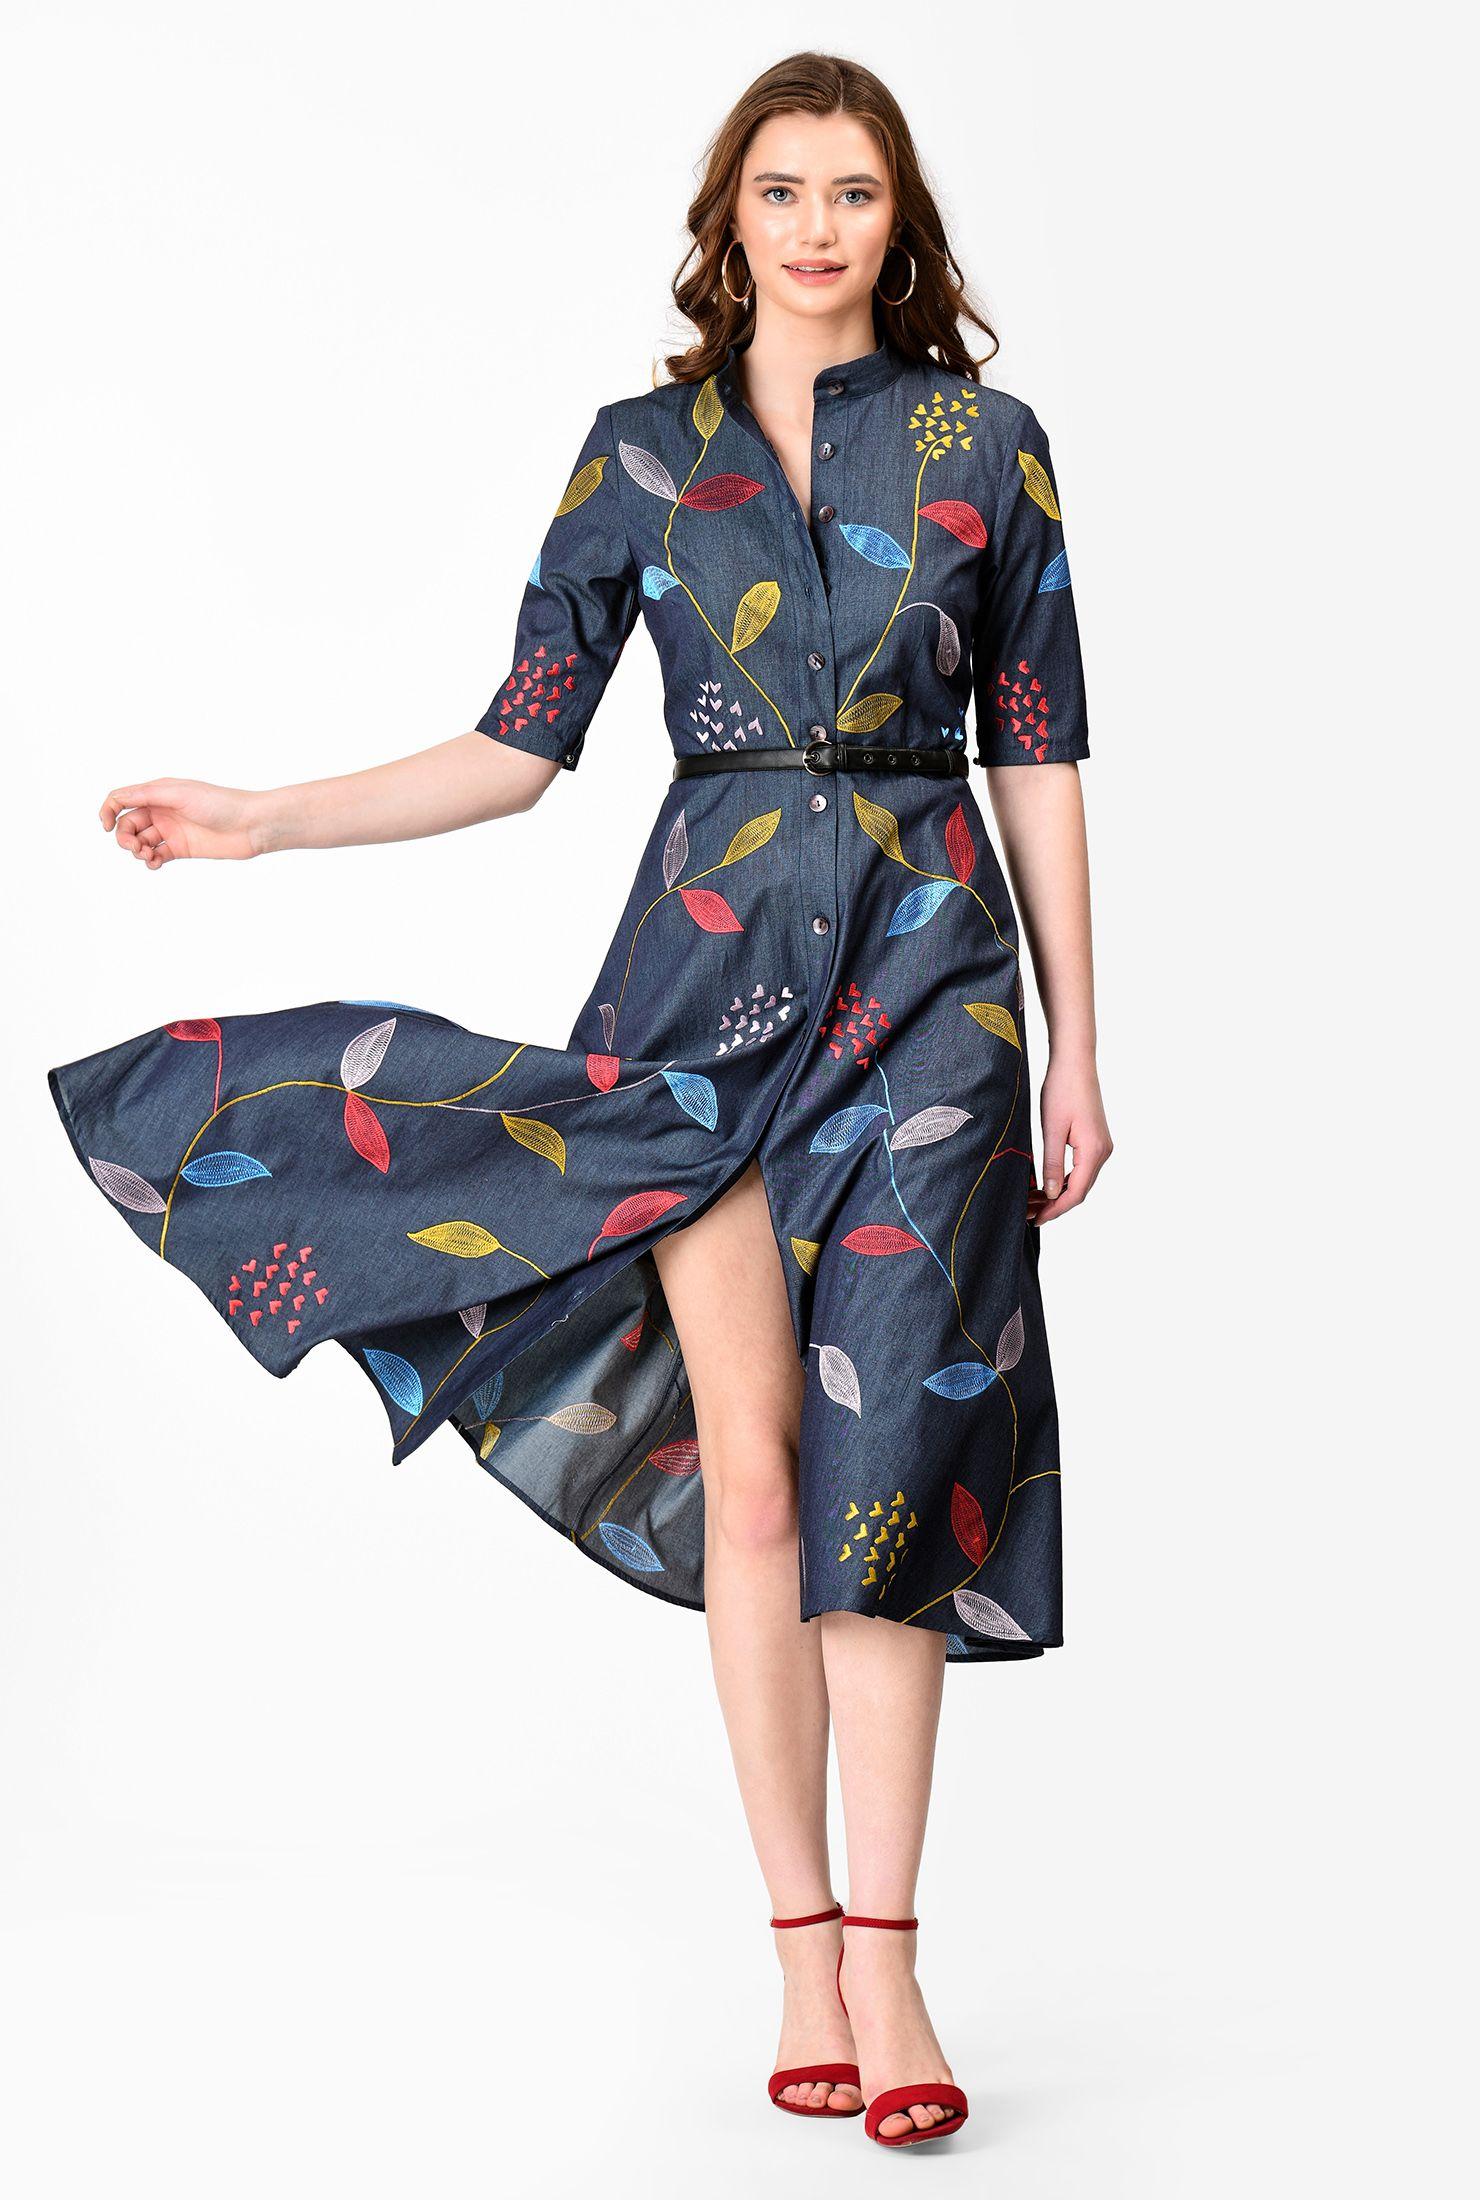 15daa9ac8d2 Women's Fashion Clothing 0-36W and Custom   No Brainer Style Board ...